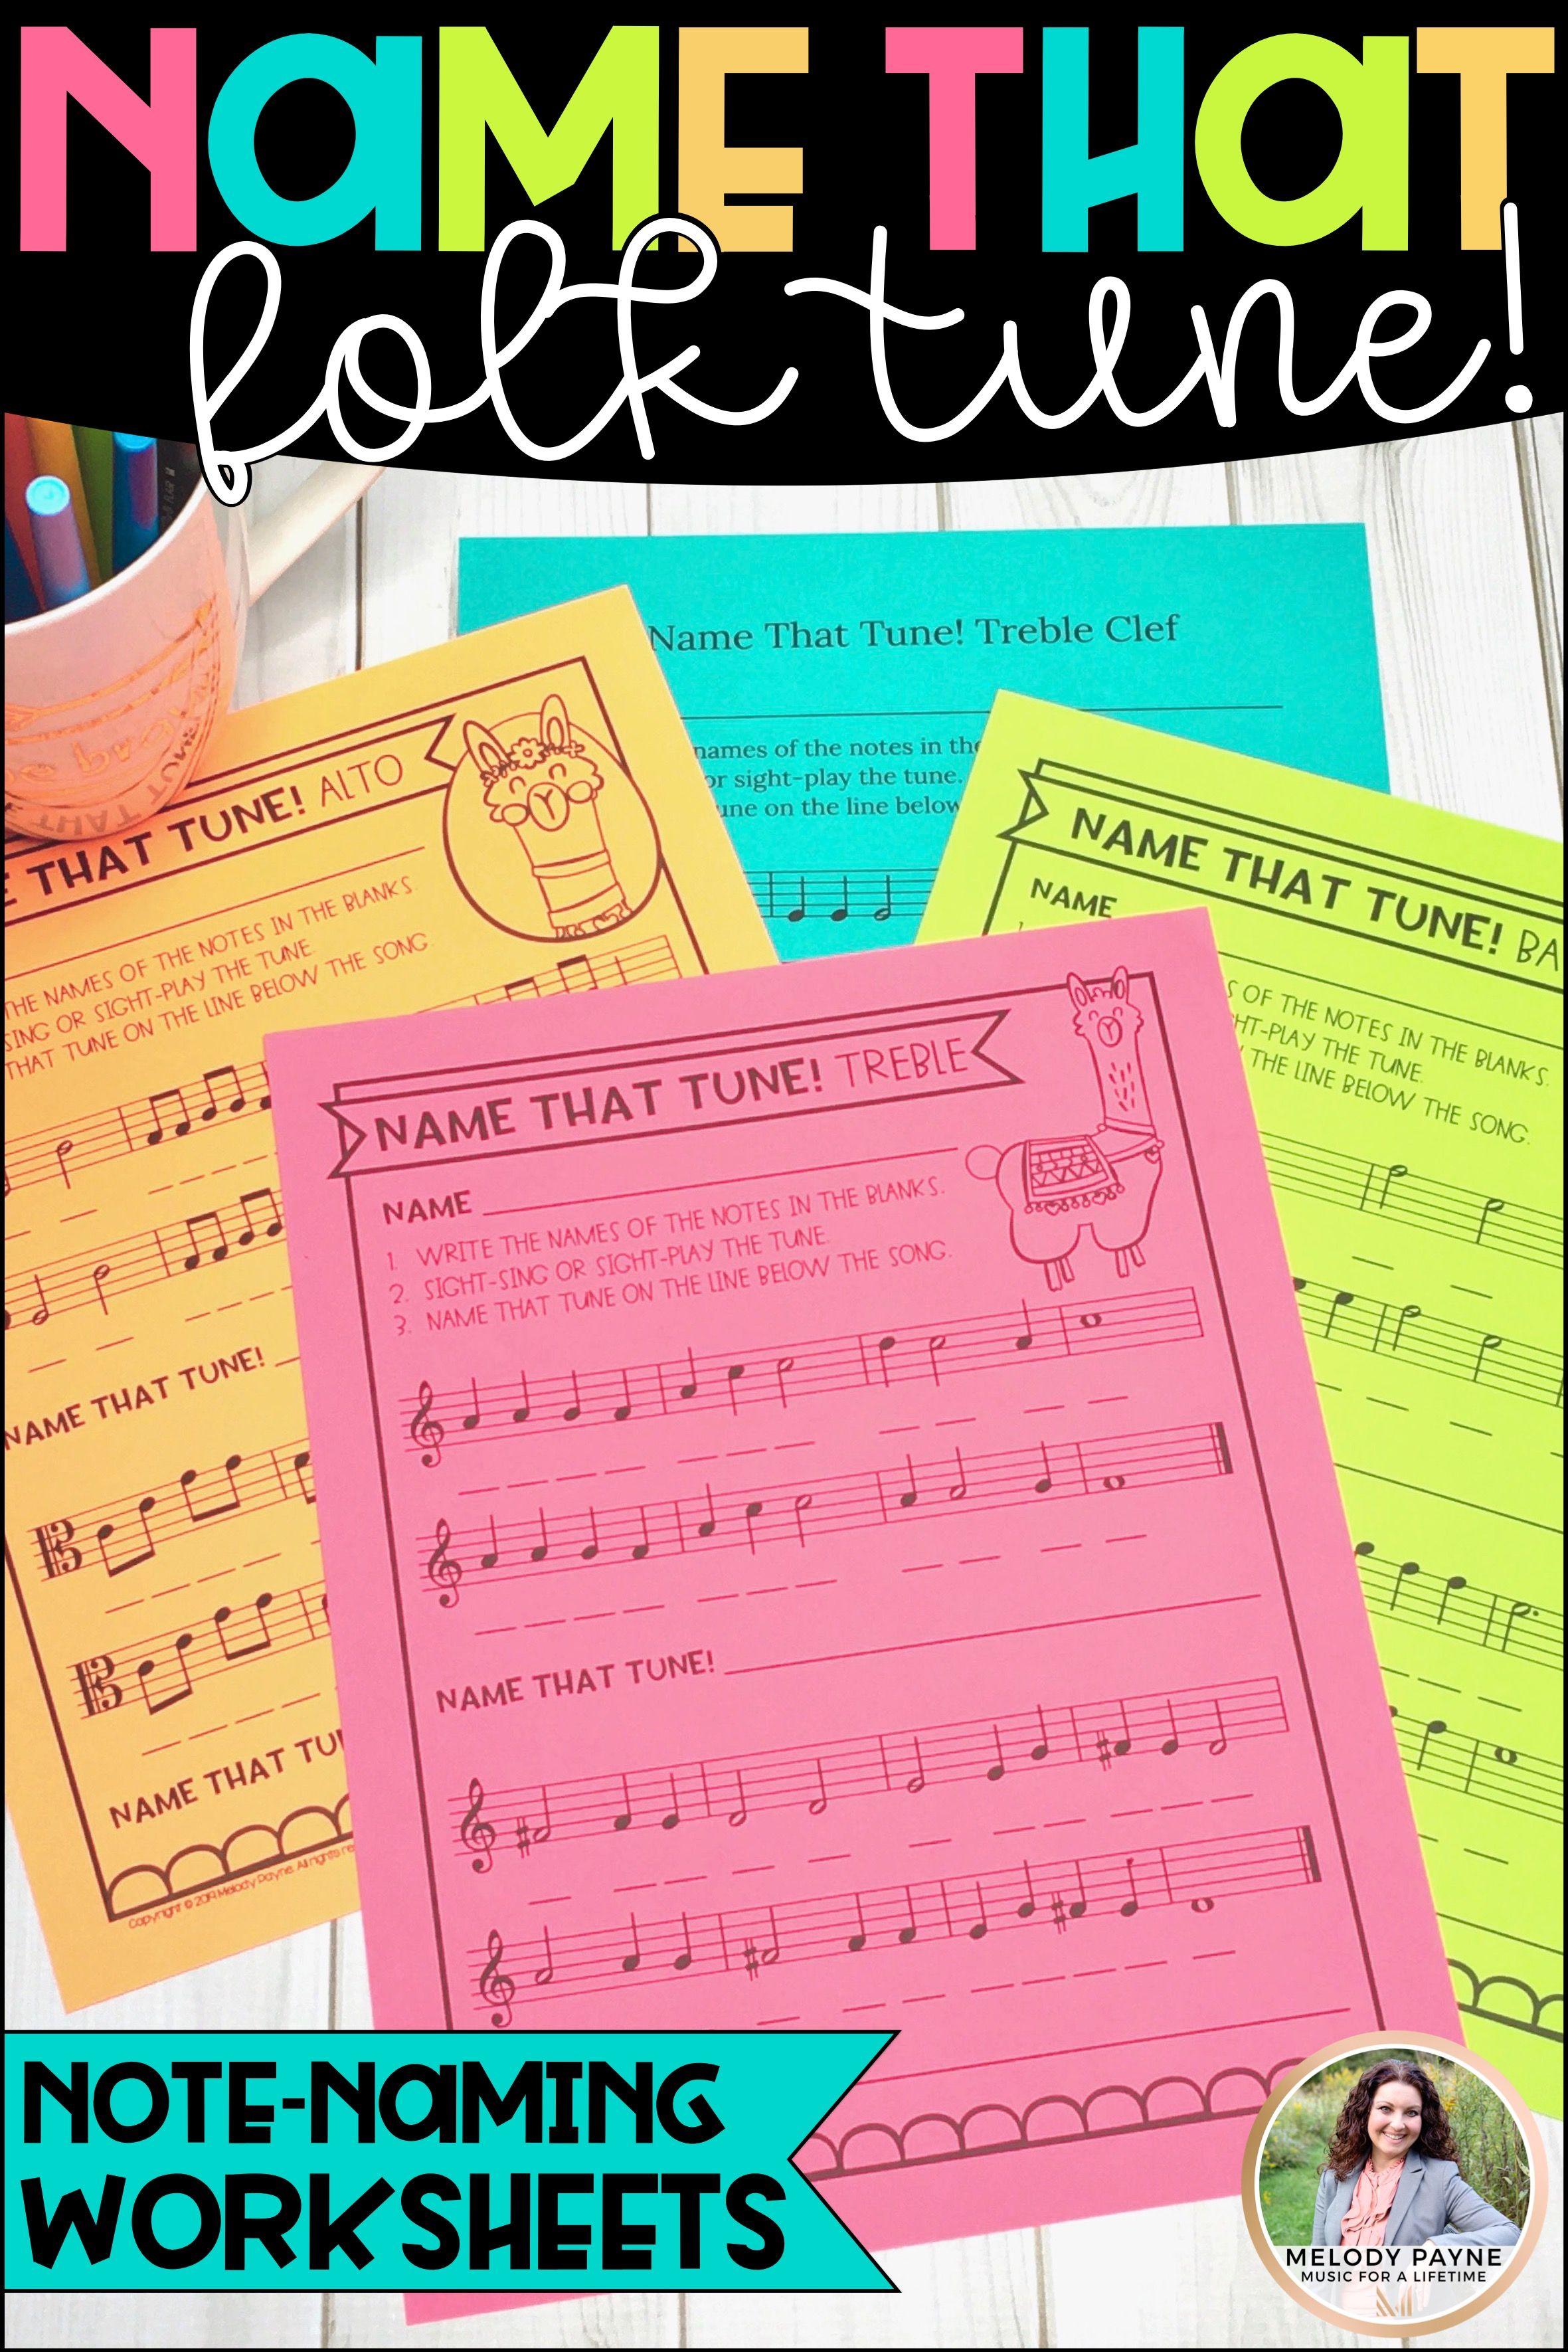 Folk Songs - Name That Tune! {Llama Music Worksheets: Treble